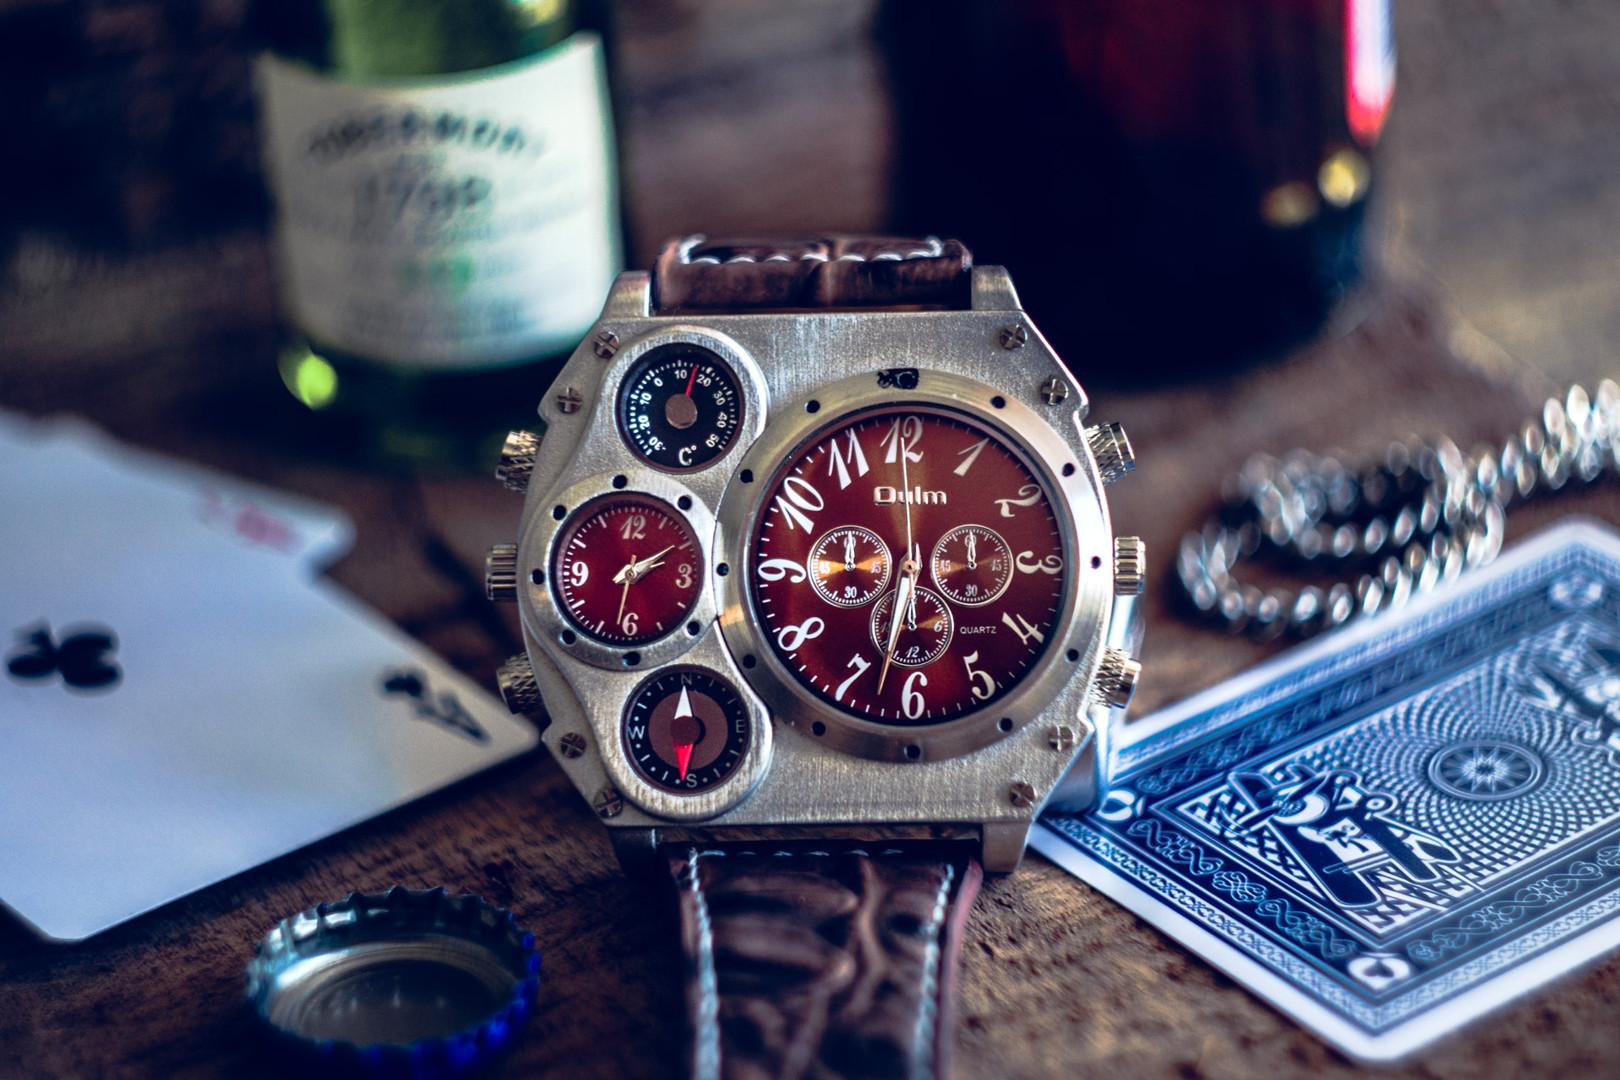 Watch Product Shot